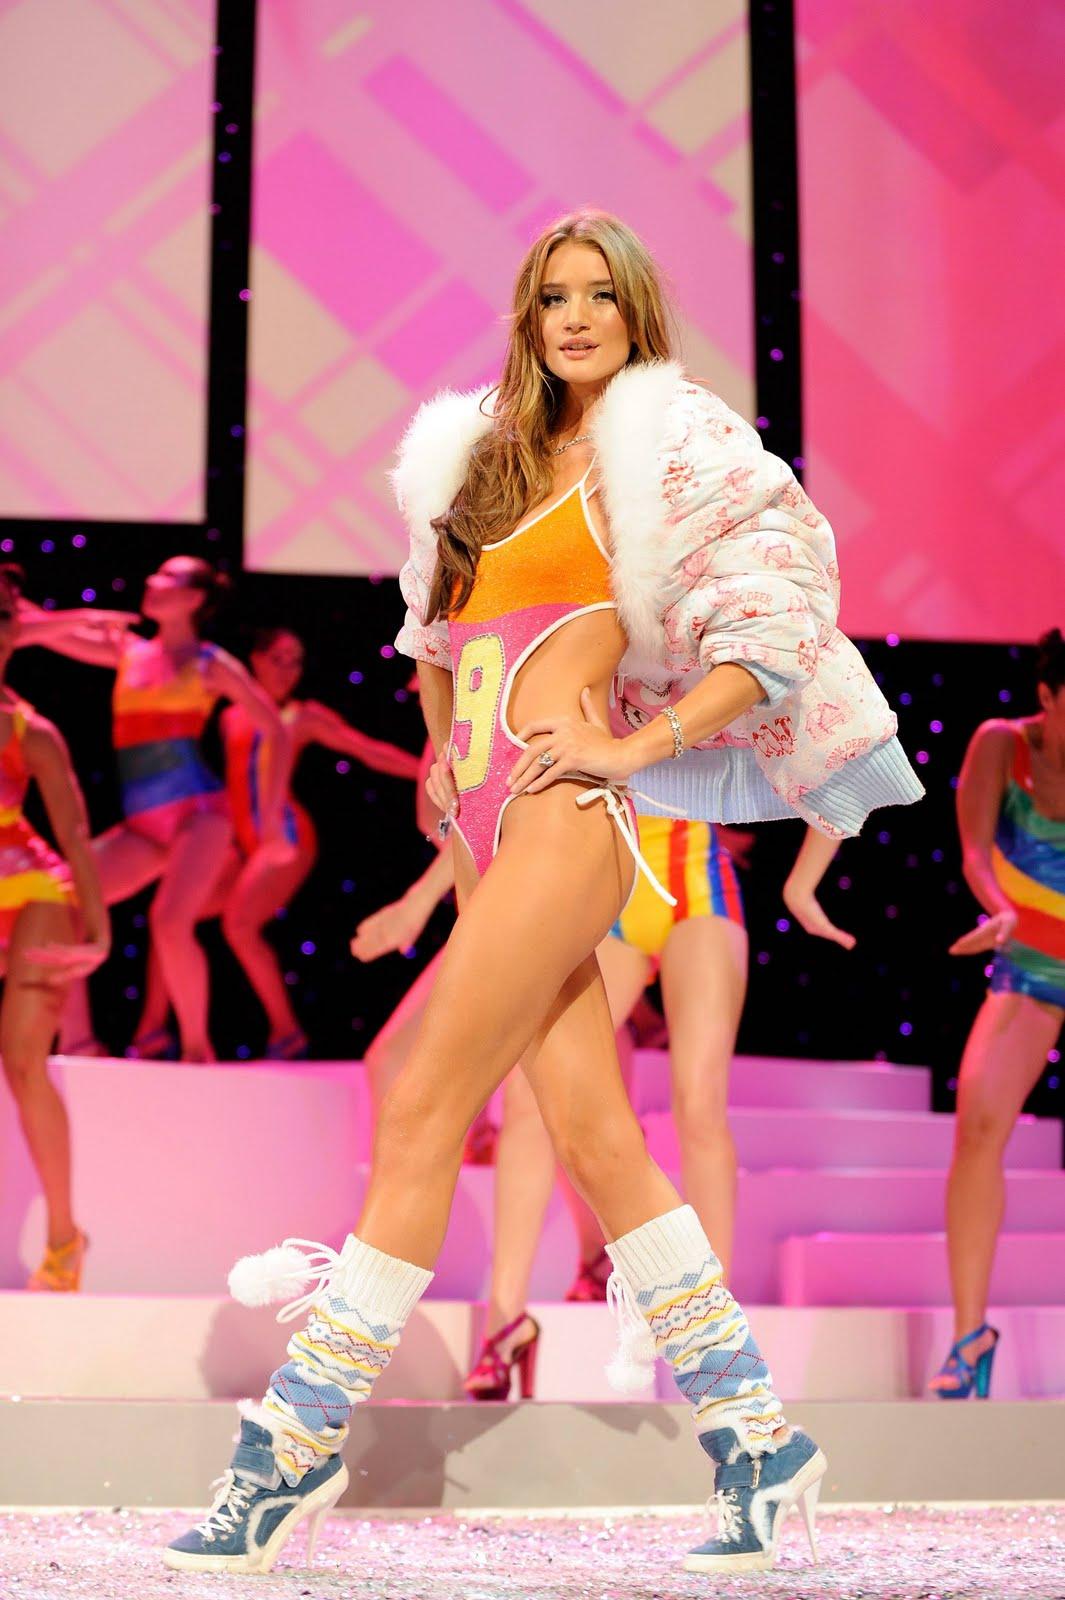 2018 FIFA World Cup - Wikipedia Victoria secret fashion show 2008 pink planet